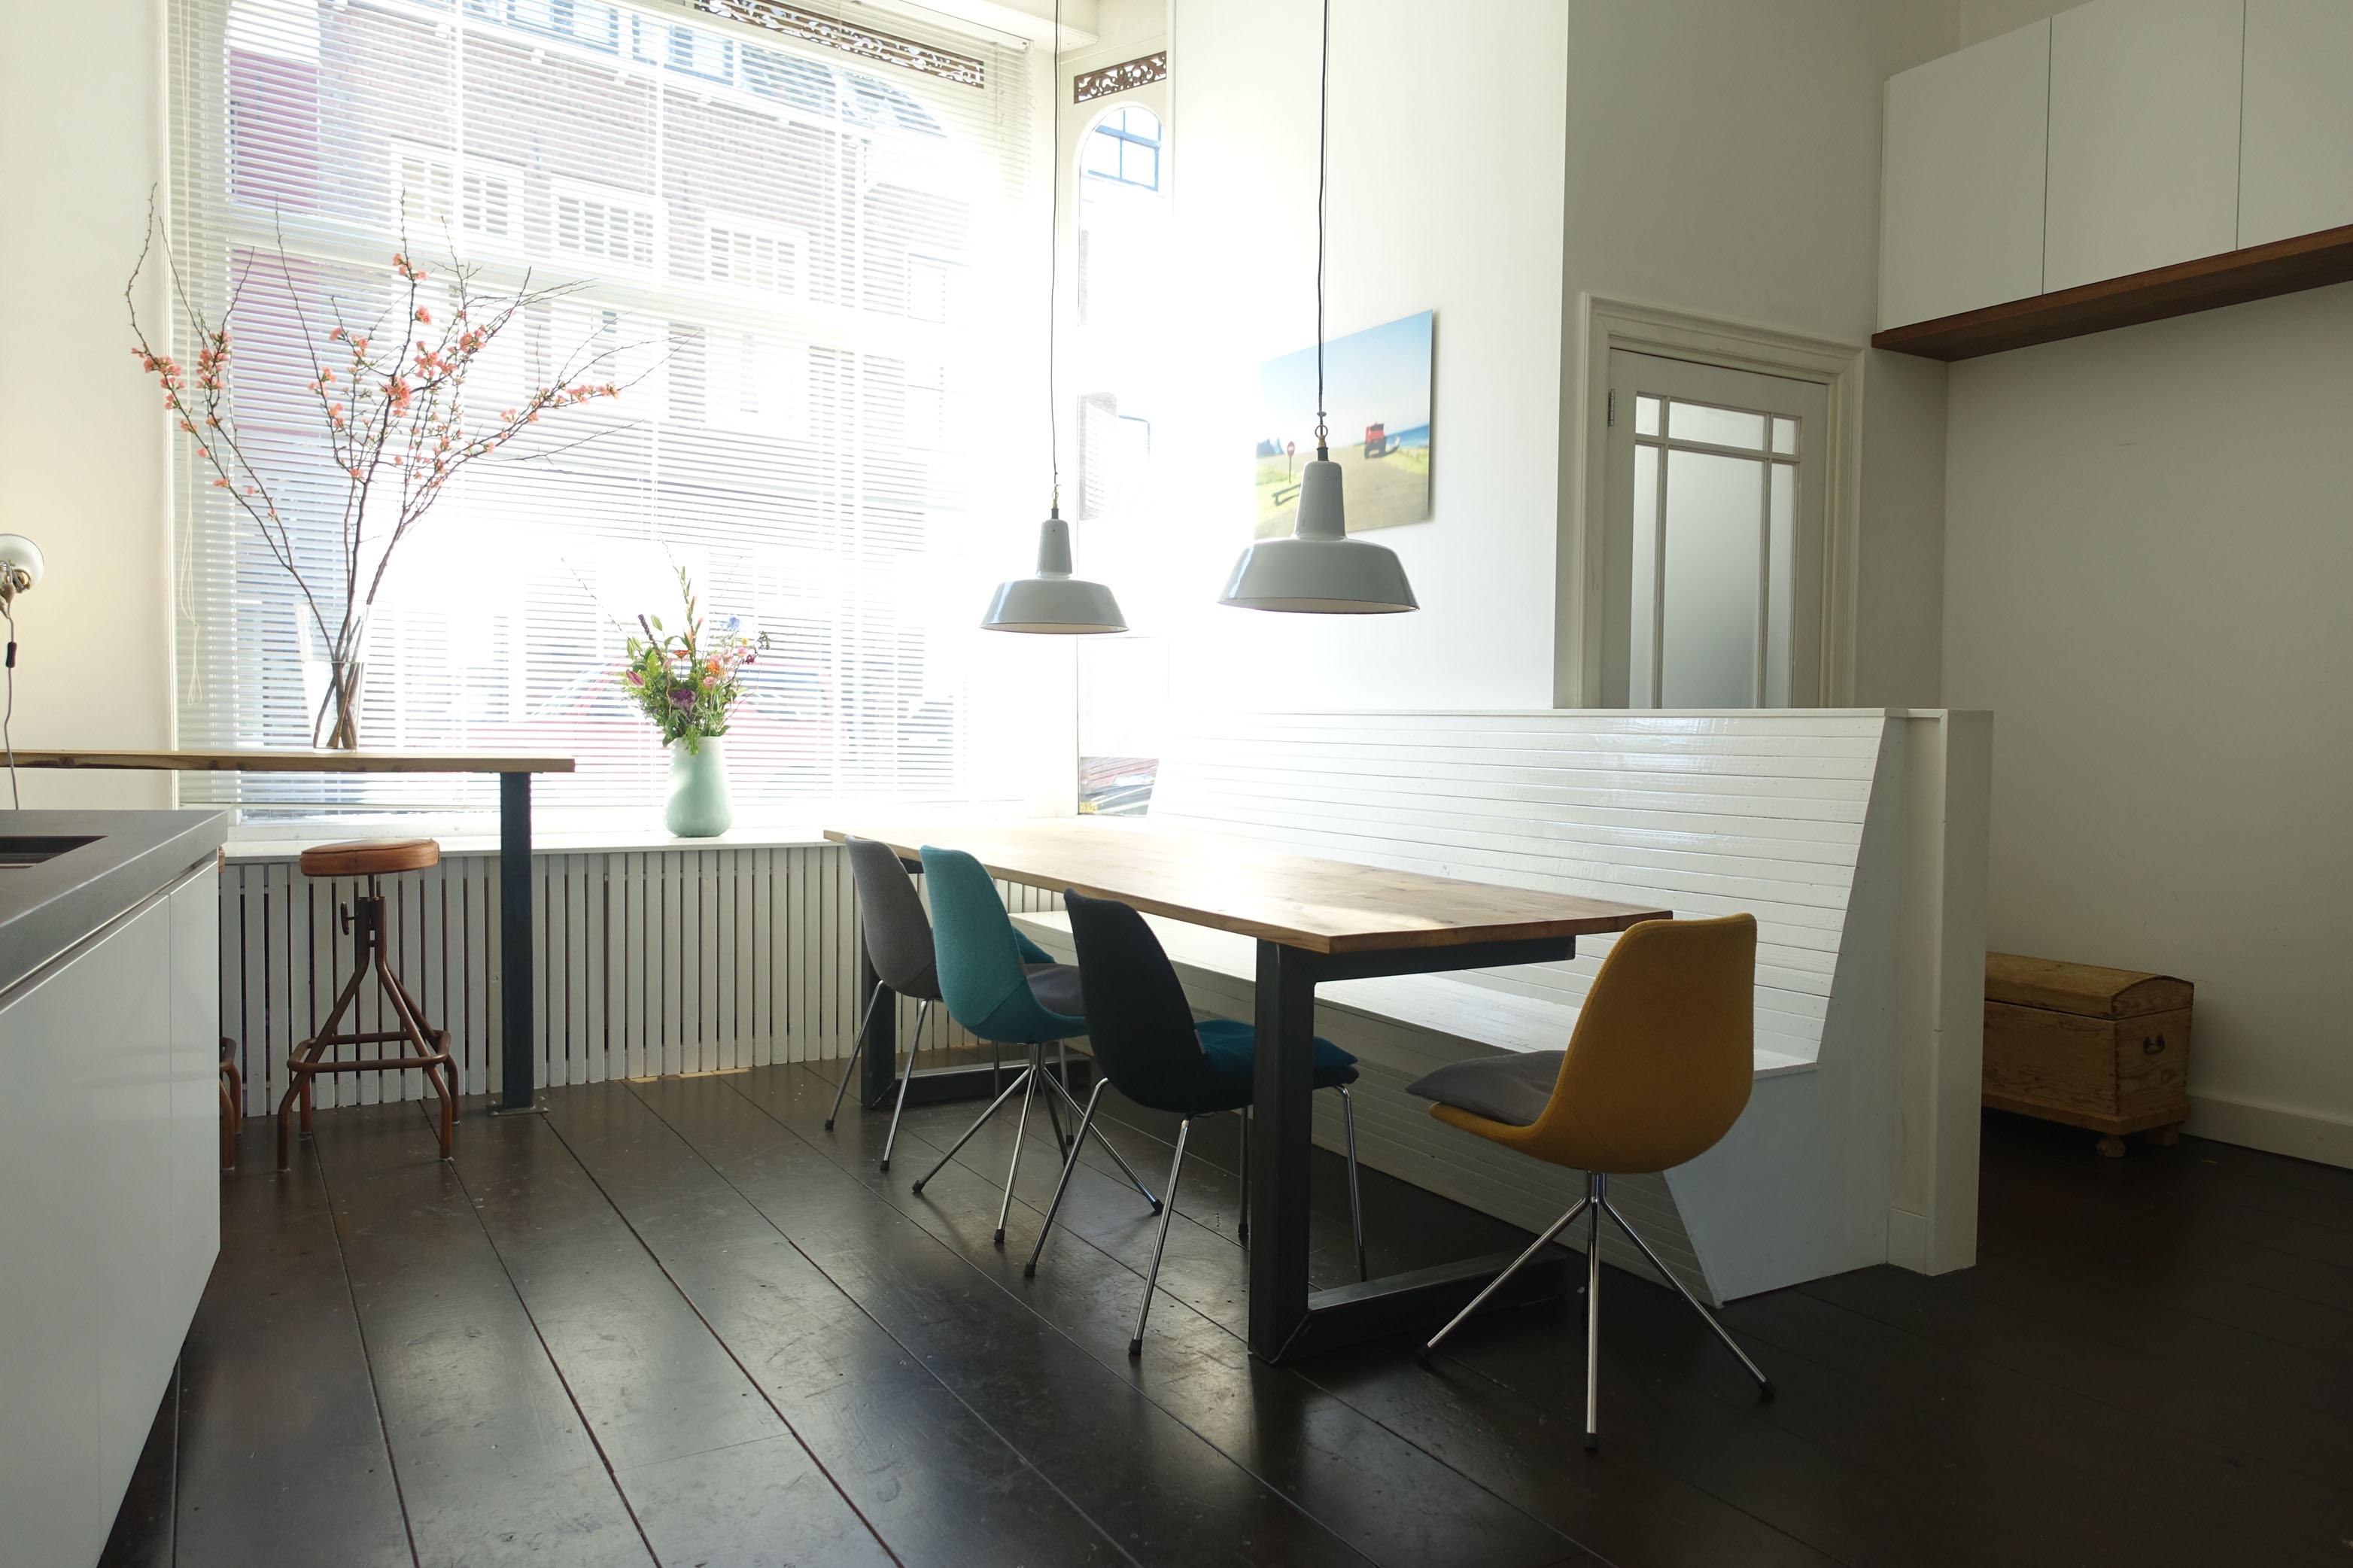 Berkhout bv onderhoud renovatie en ontwerp interieur for Hoogebeen interieur bv